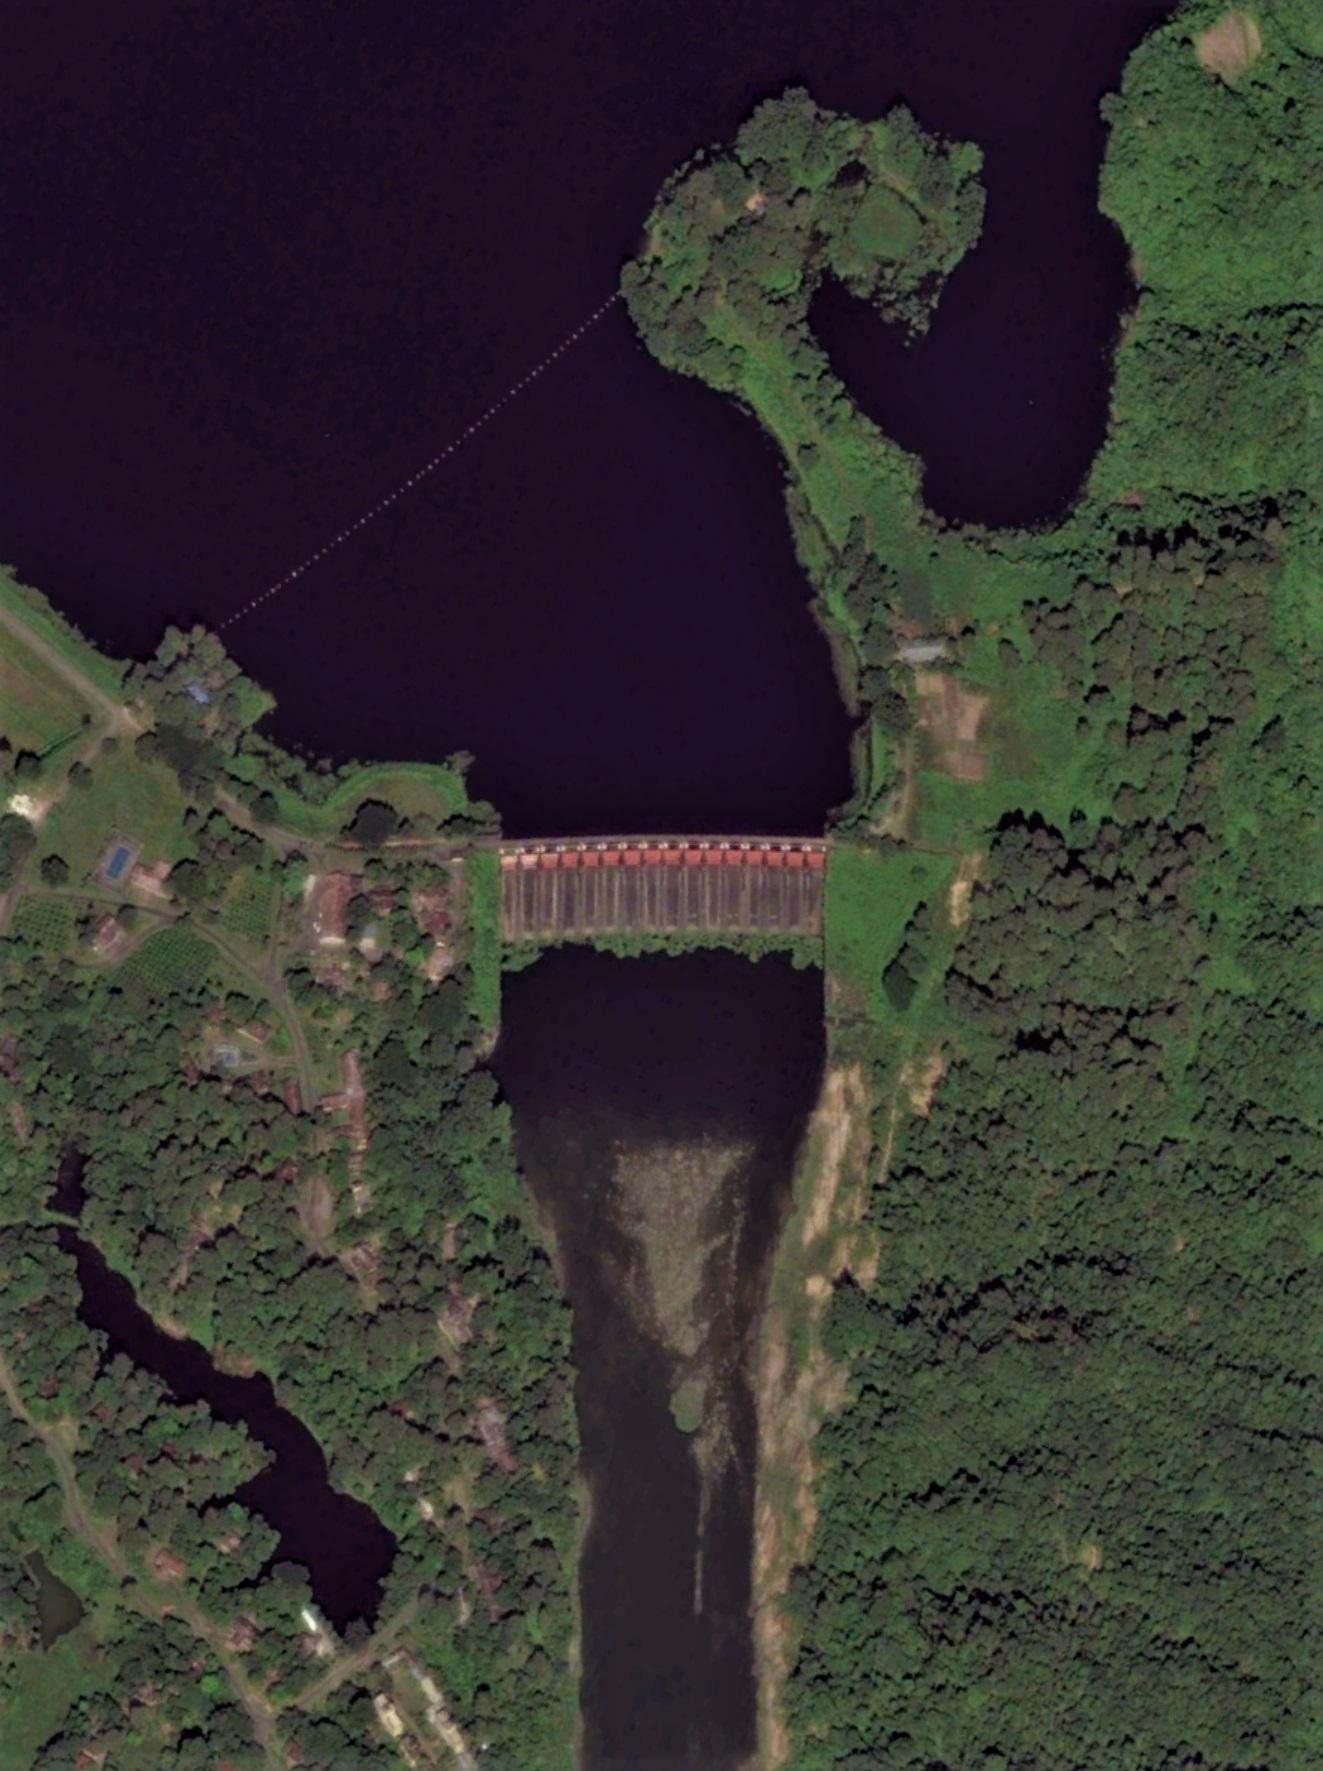 Kaptai hydropower dam in November 2014. Image width: 850 meter